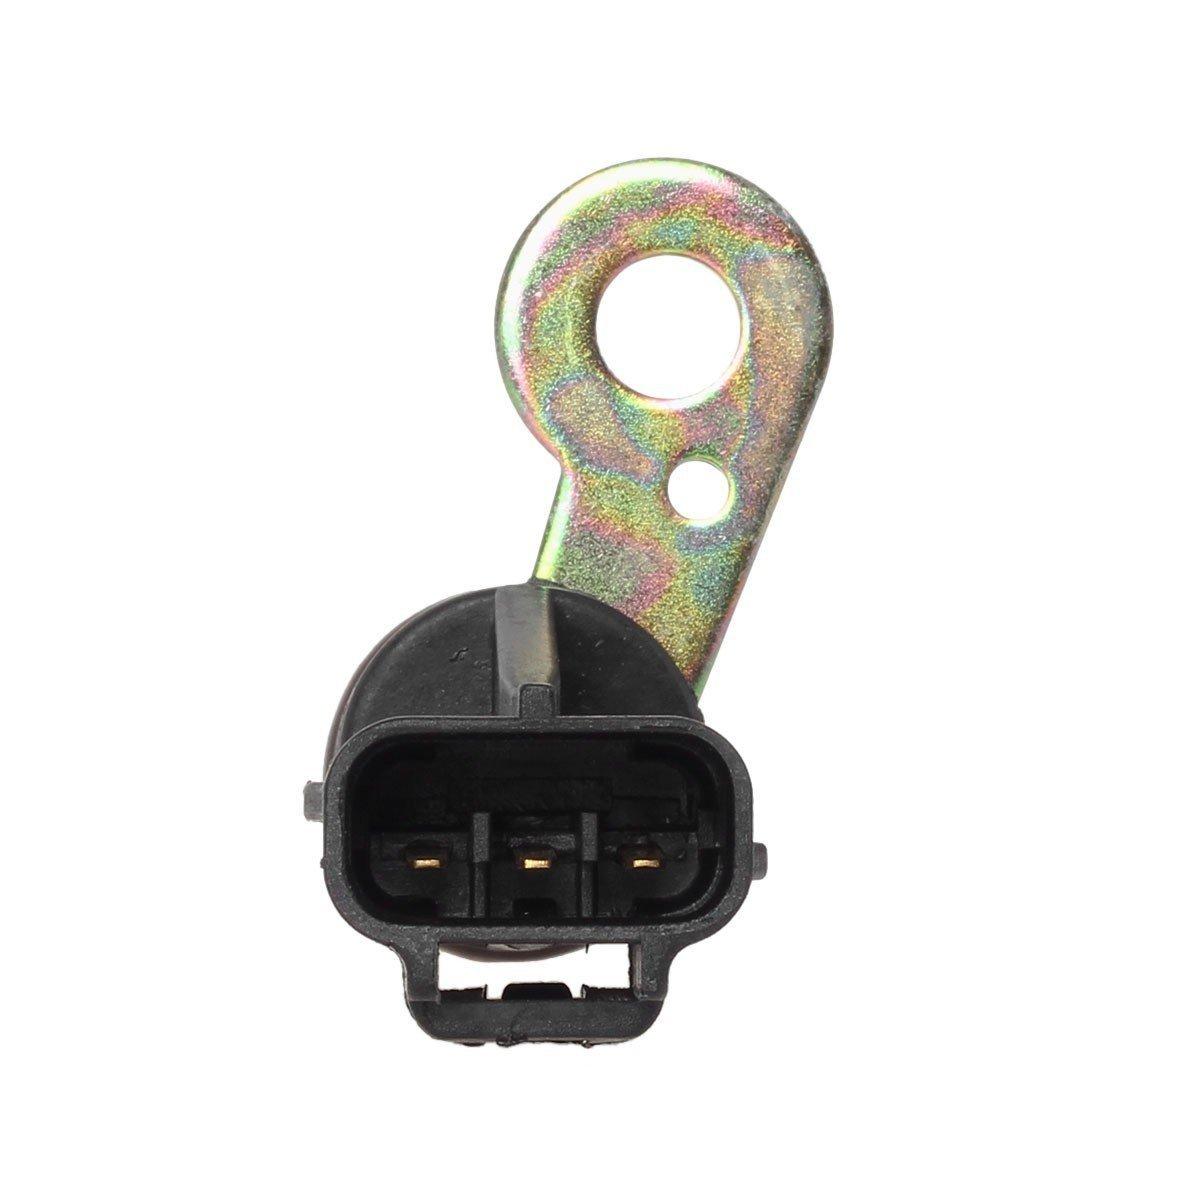 AUTEX 1pc Throttle Position Sensor TPS /& Crankshaft Position Sensor TH190 PC284 Compatible with Dodge Dakota /& Durango /& Ram 1500// Jeep Commander /& Grand Cherokee//Mitsubishi Raider 1999-2007